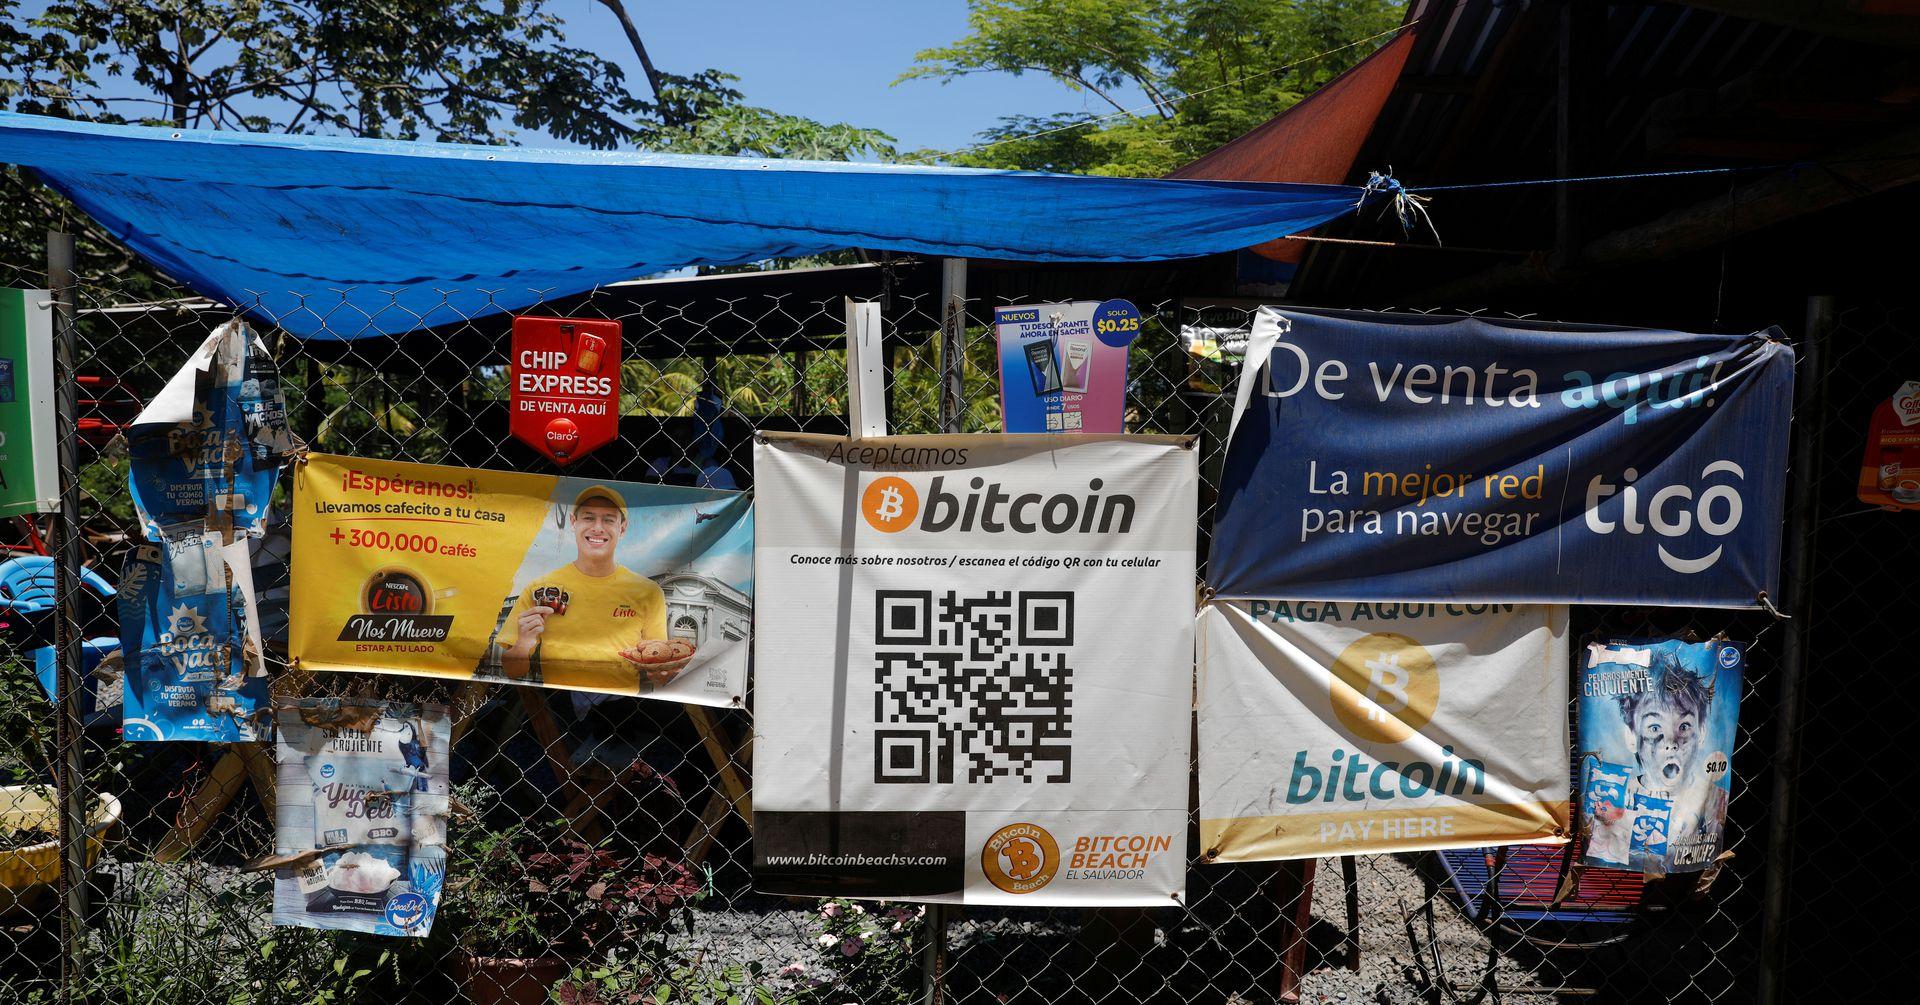 In a world first, El Salvador makes bitcoin legal tender | Reuters